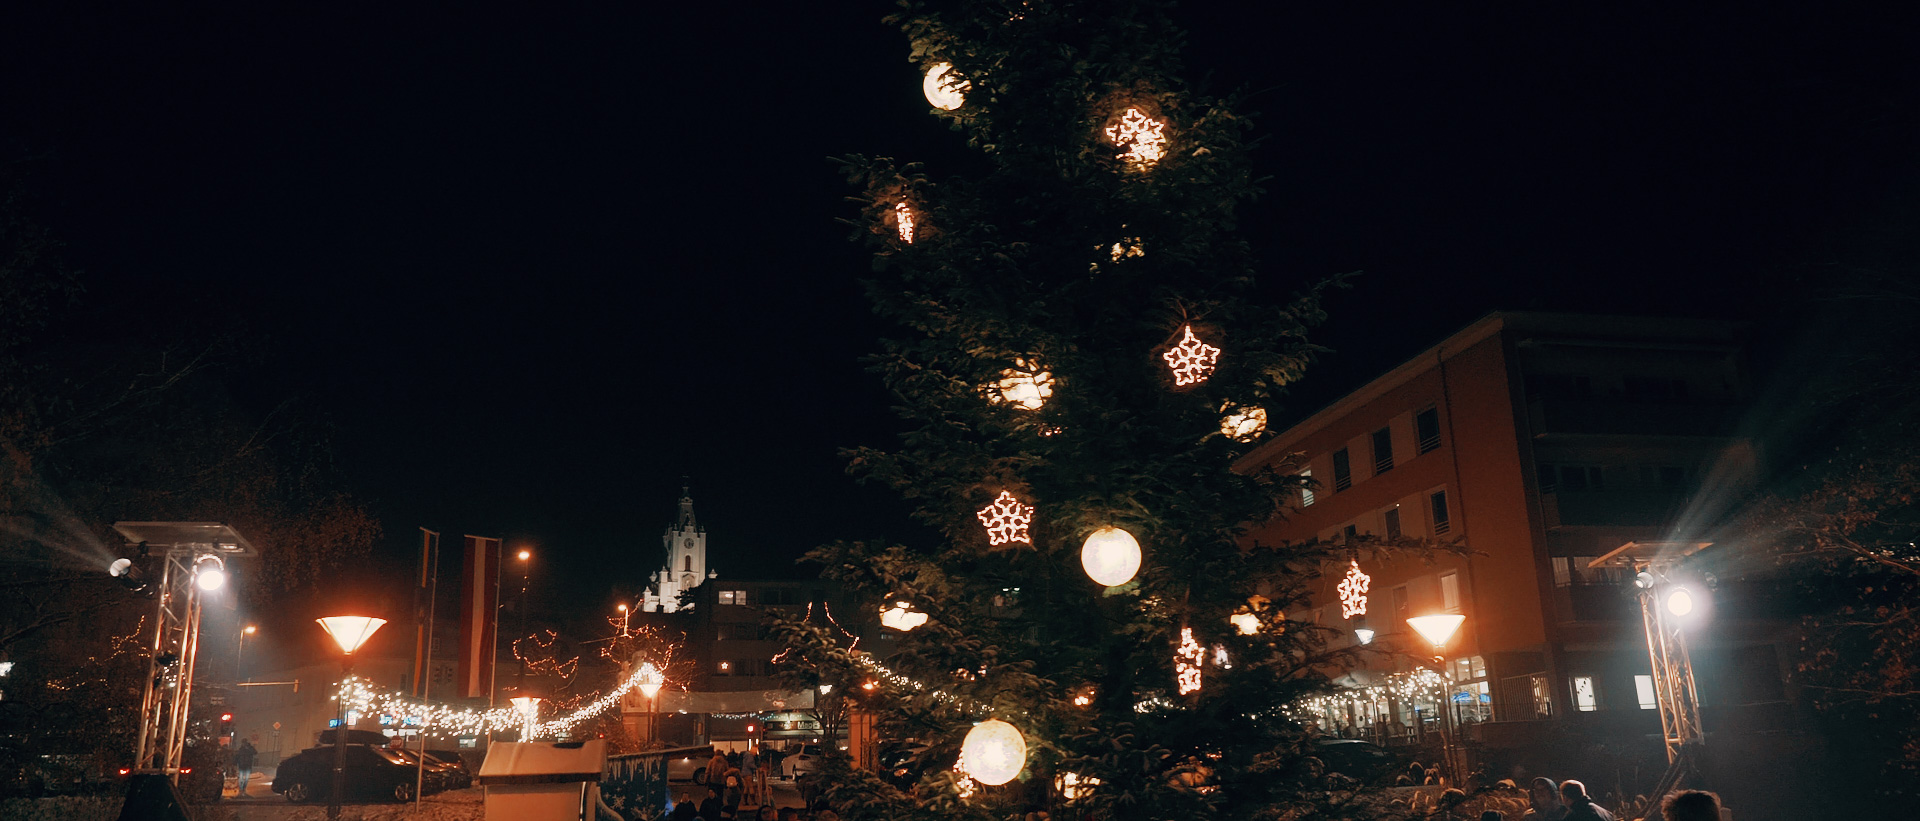 Maerchenhafer_Advent_03.jpg